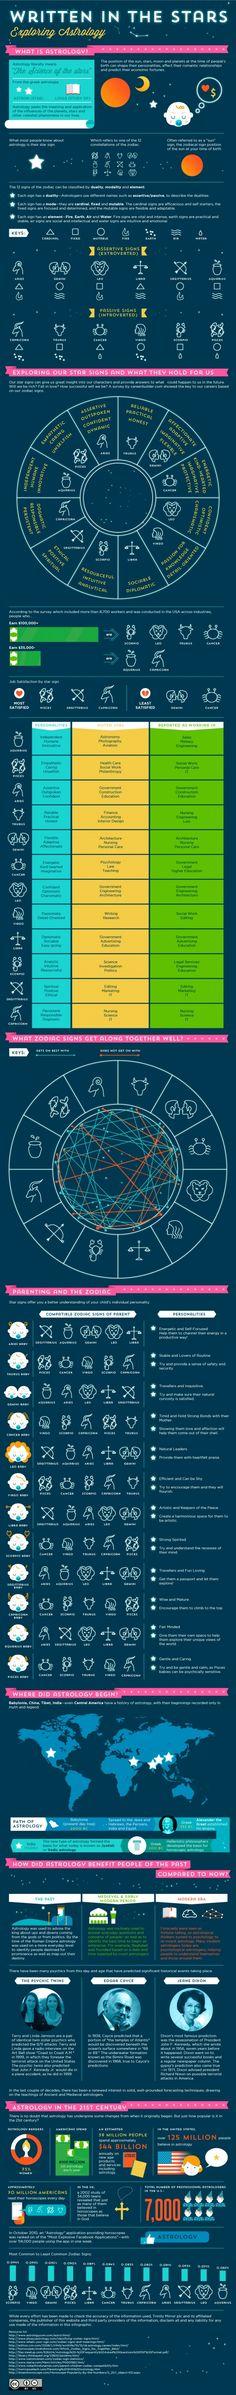 Written In The Stars: Exploring Astrology | NerdGraph Infographics